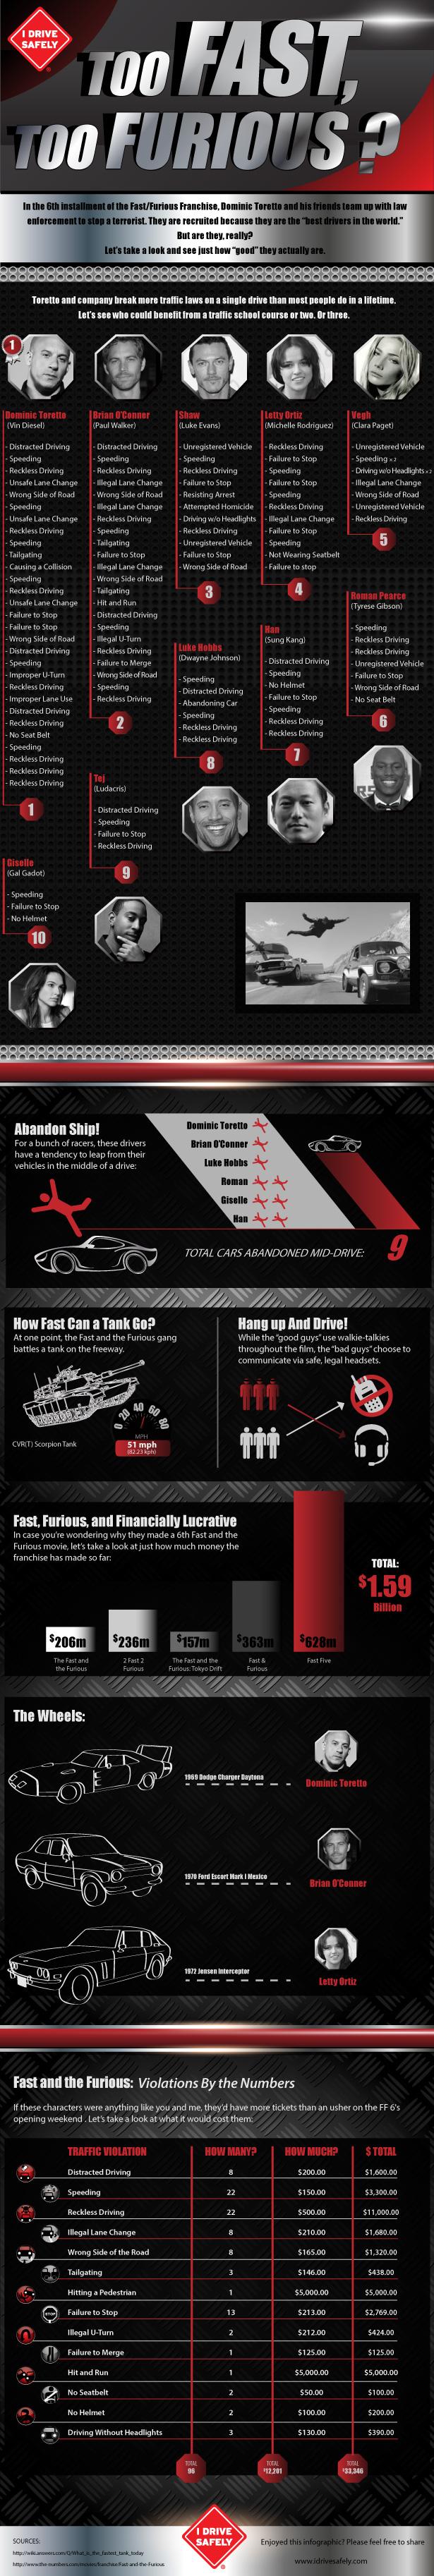 too Fast too Furious-Infographic